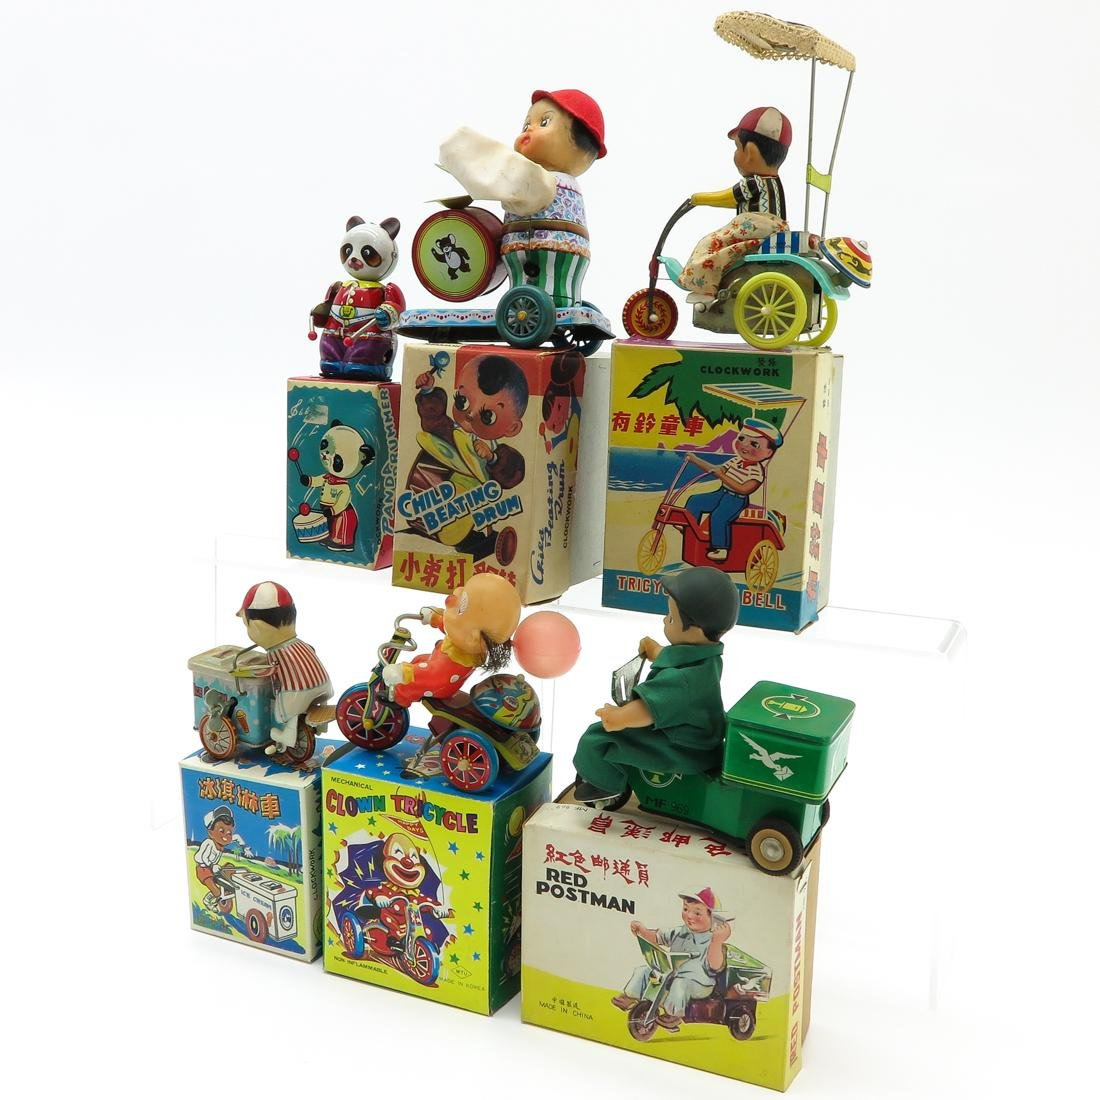 Diverse Lot of 6 Vintage Toys - 3